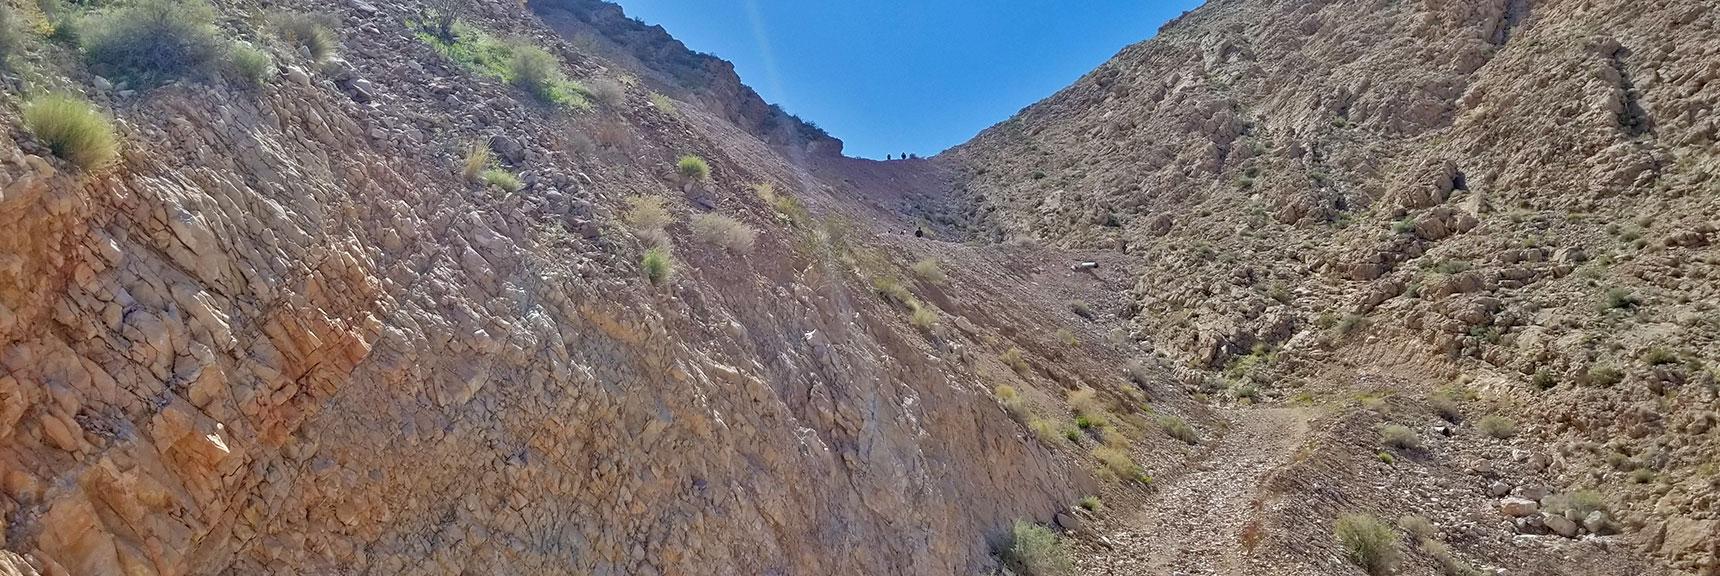 Ascending Toward First Summit of Frenchman Mountain, Nevada